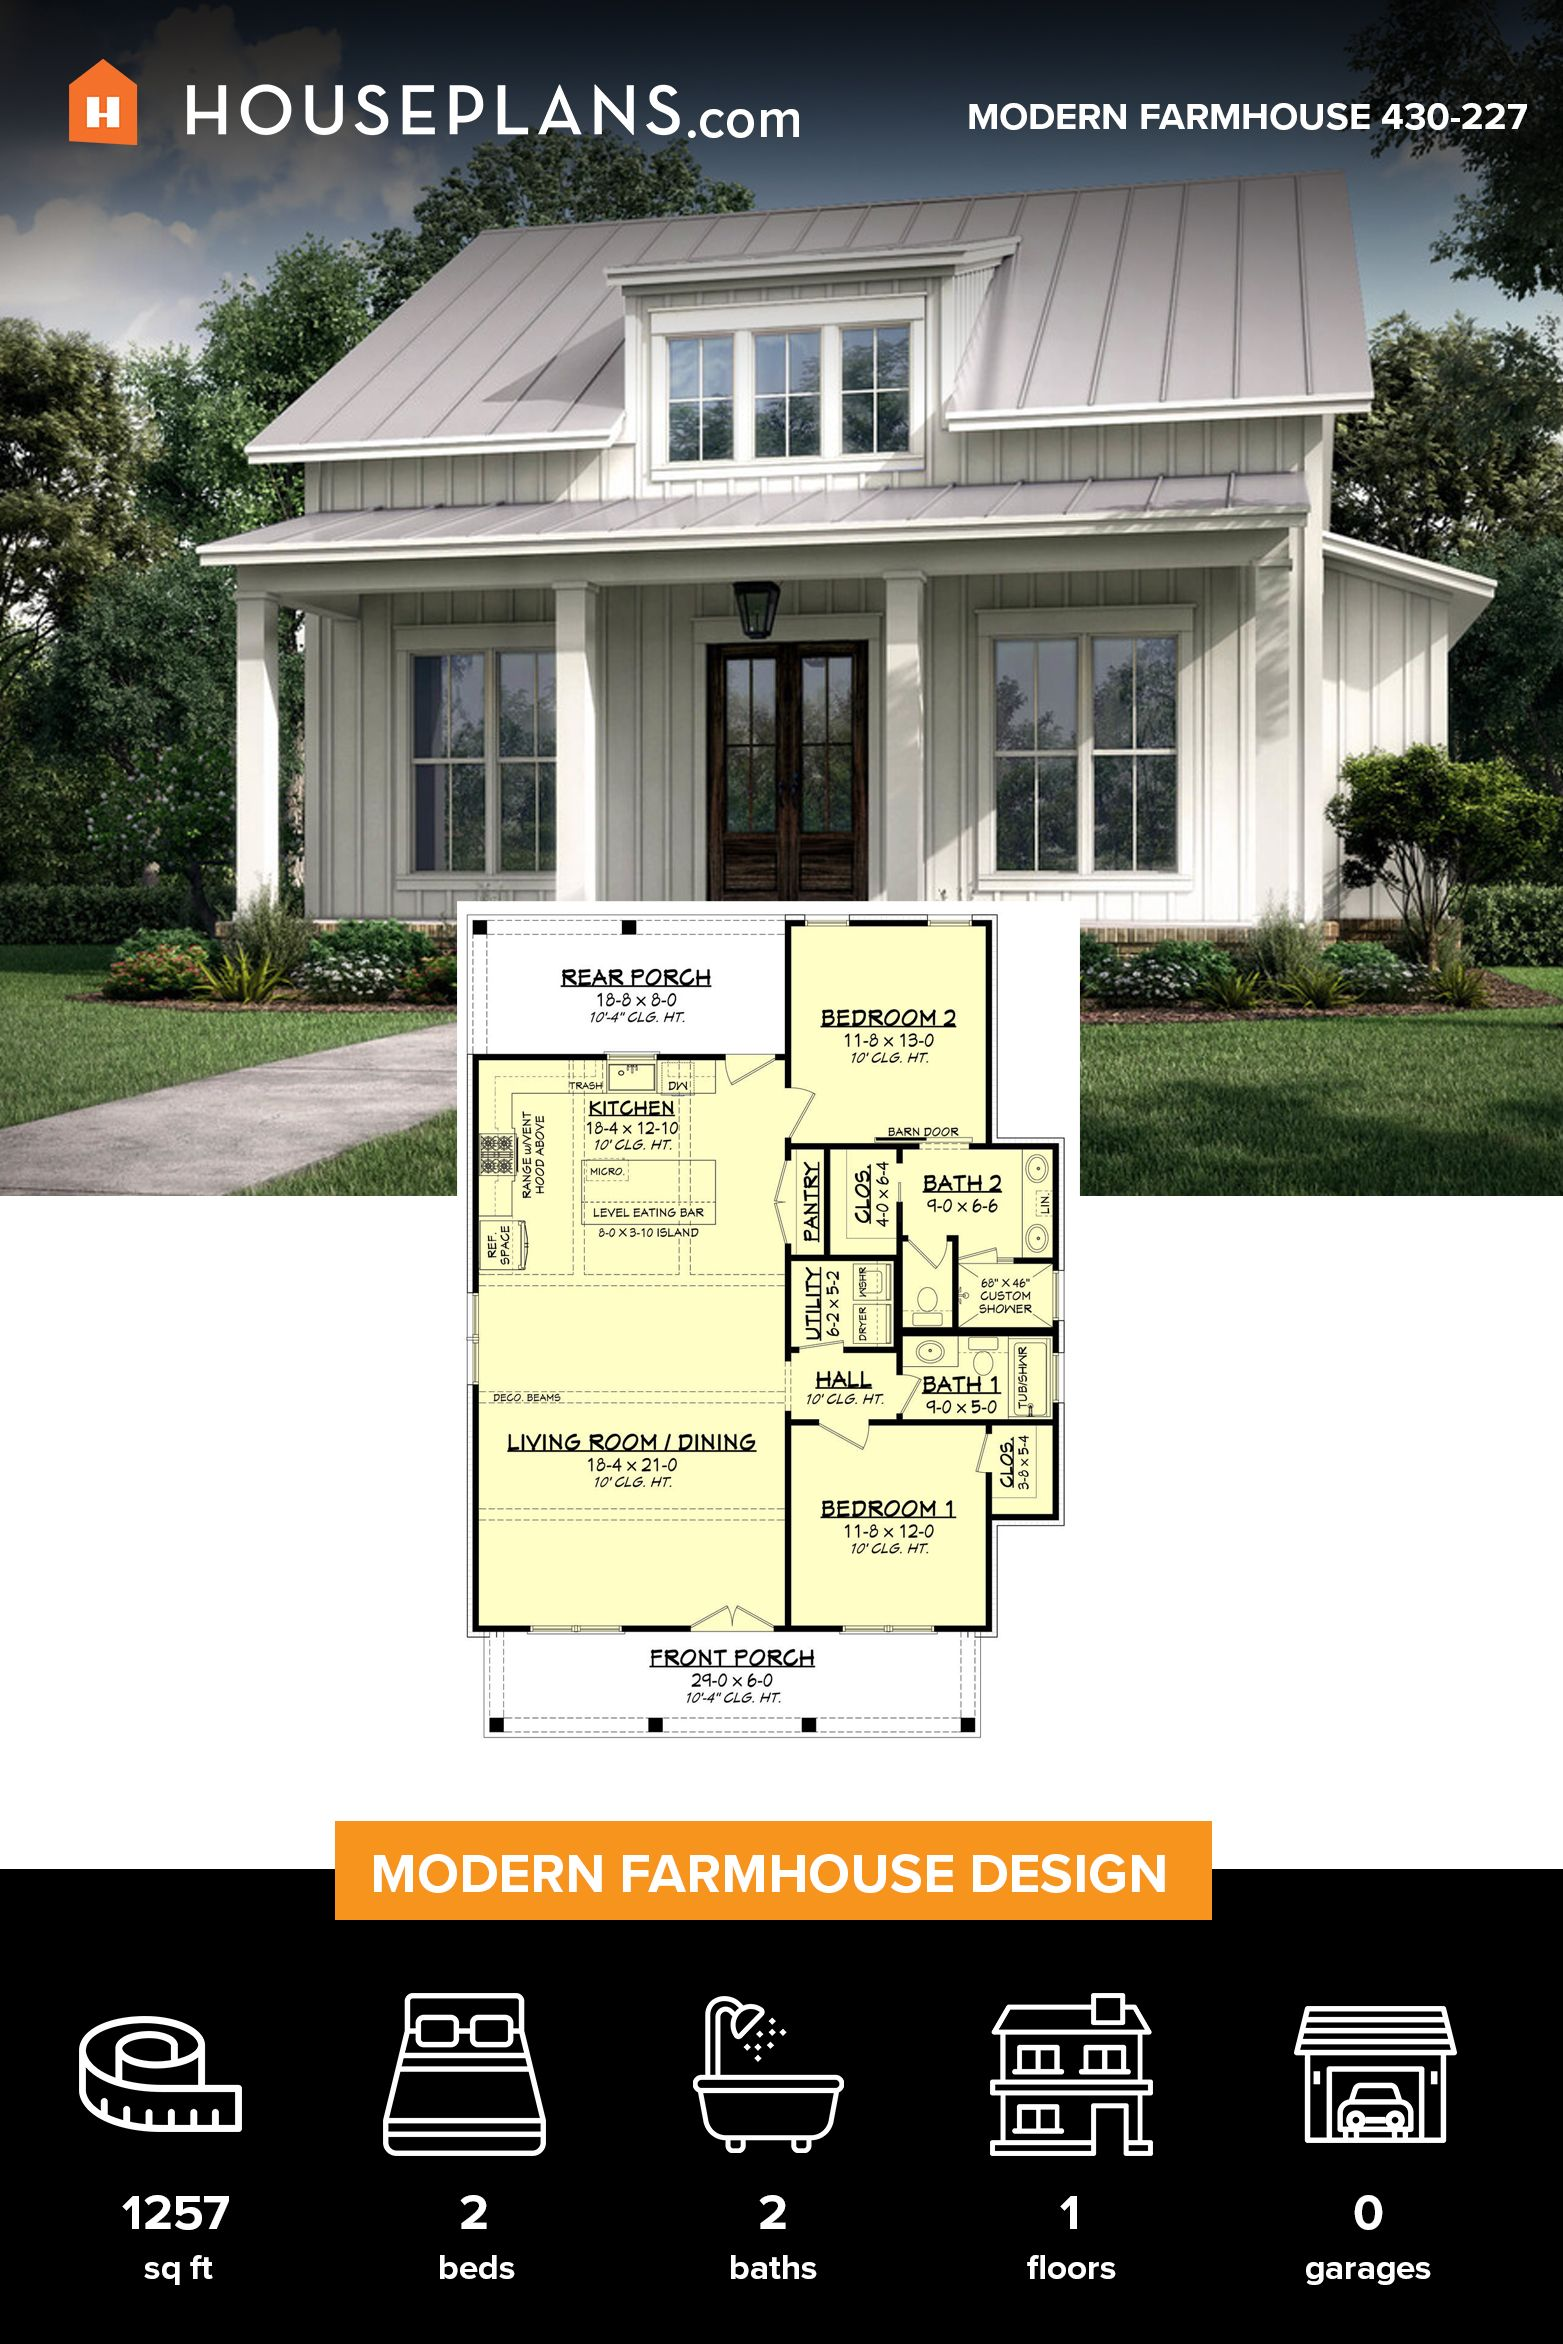 Farmhouse Style House Plan 2 Beds 2 Baths 1257 Sq Ft Plan 430 227 Farmhouse Style House Farmhouse Style House Plans Modern Farmhouse Plans